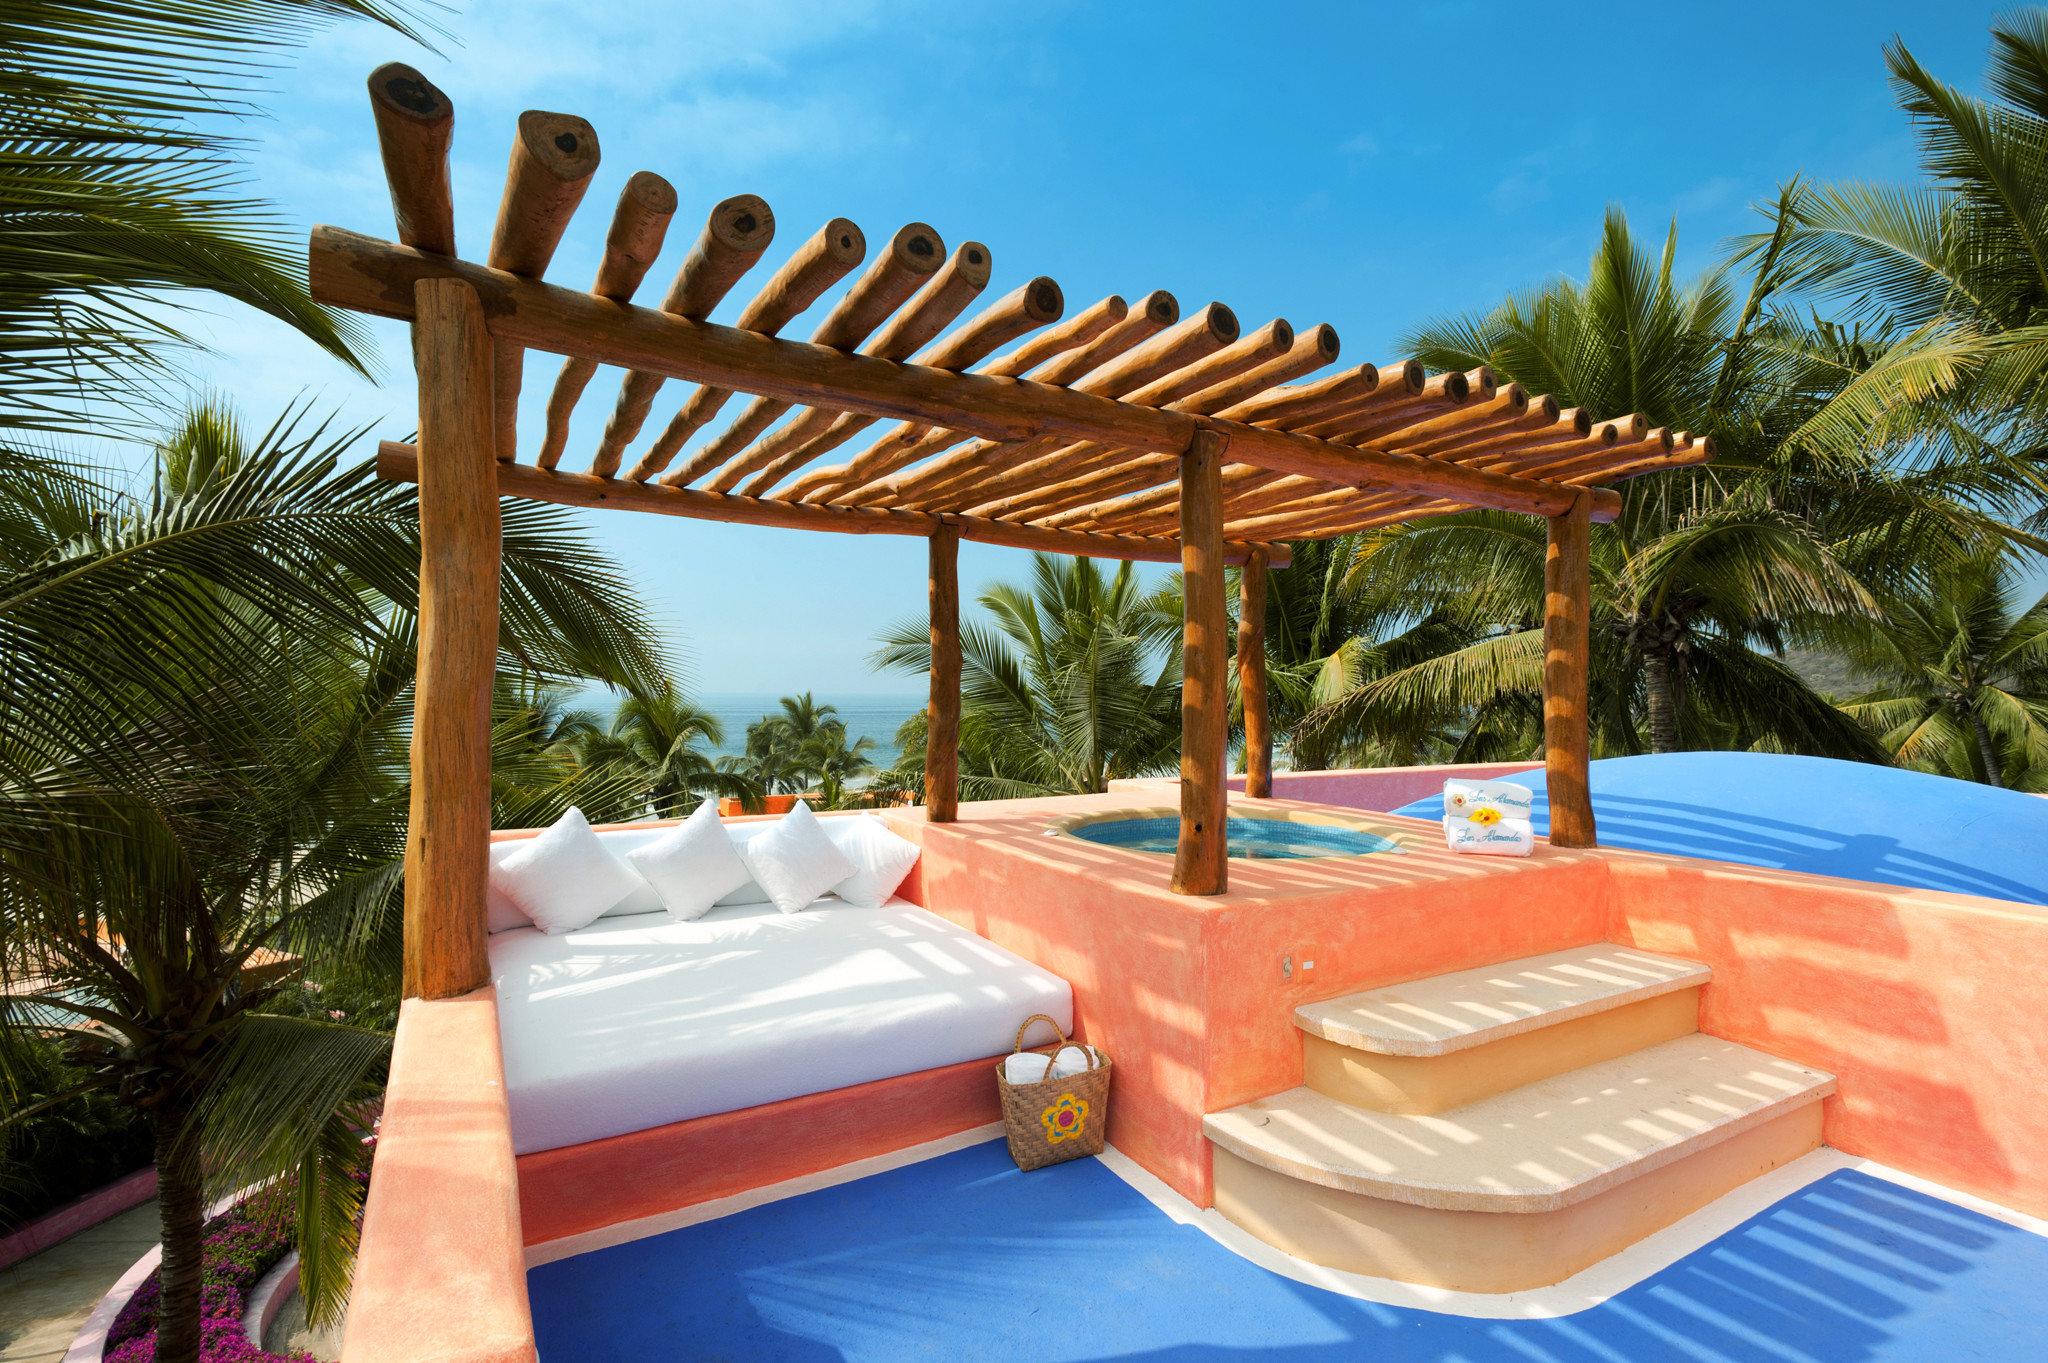 Beachfront Hot tub Hot tub/Jacuzzi Hotels Luxury Romance tree swimming pool property leisure Resort Villa eco hotel outdoor structure hacienda caribbean